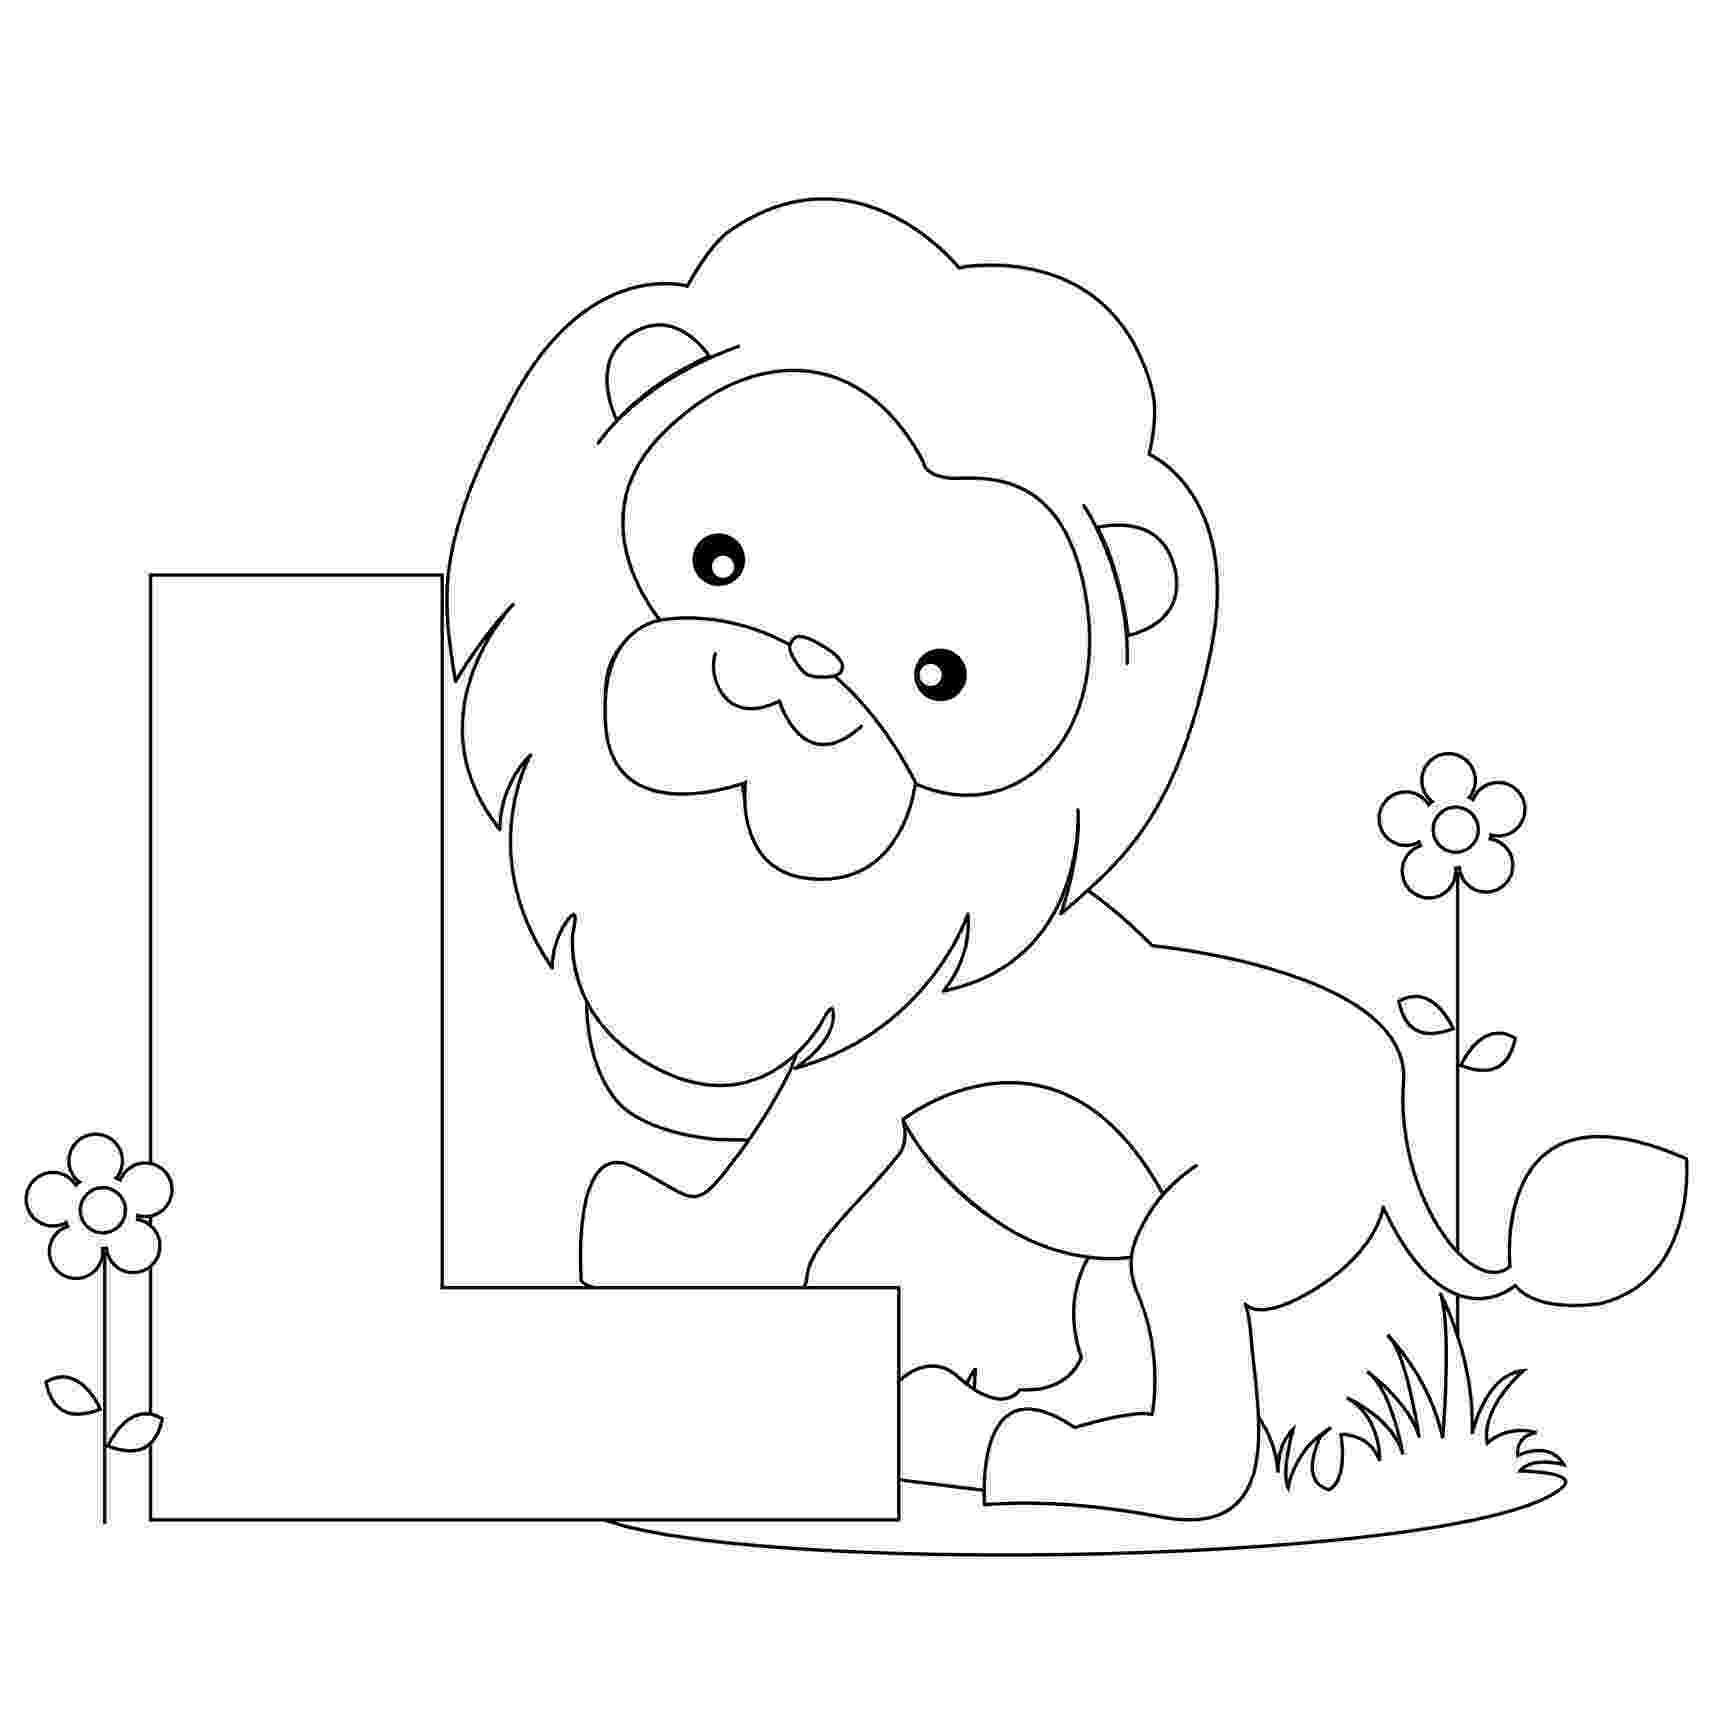 abc coloring sheets free printable alphabet coloring pages for kids best coloring sheets abc 1 1